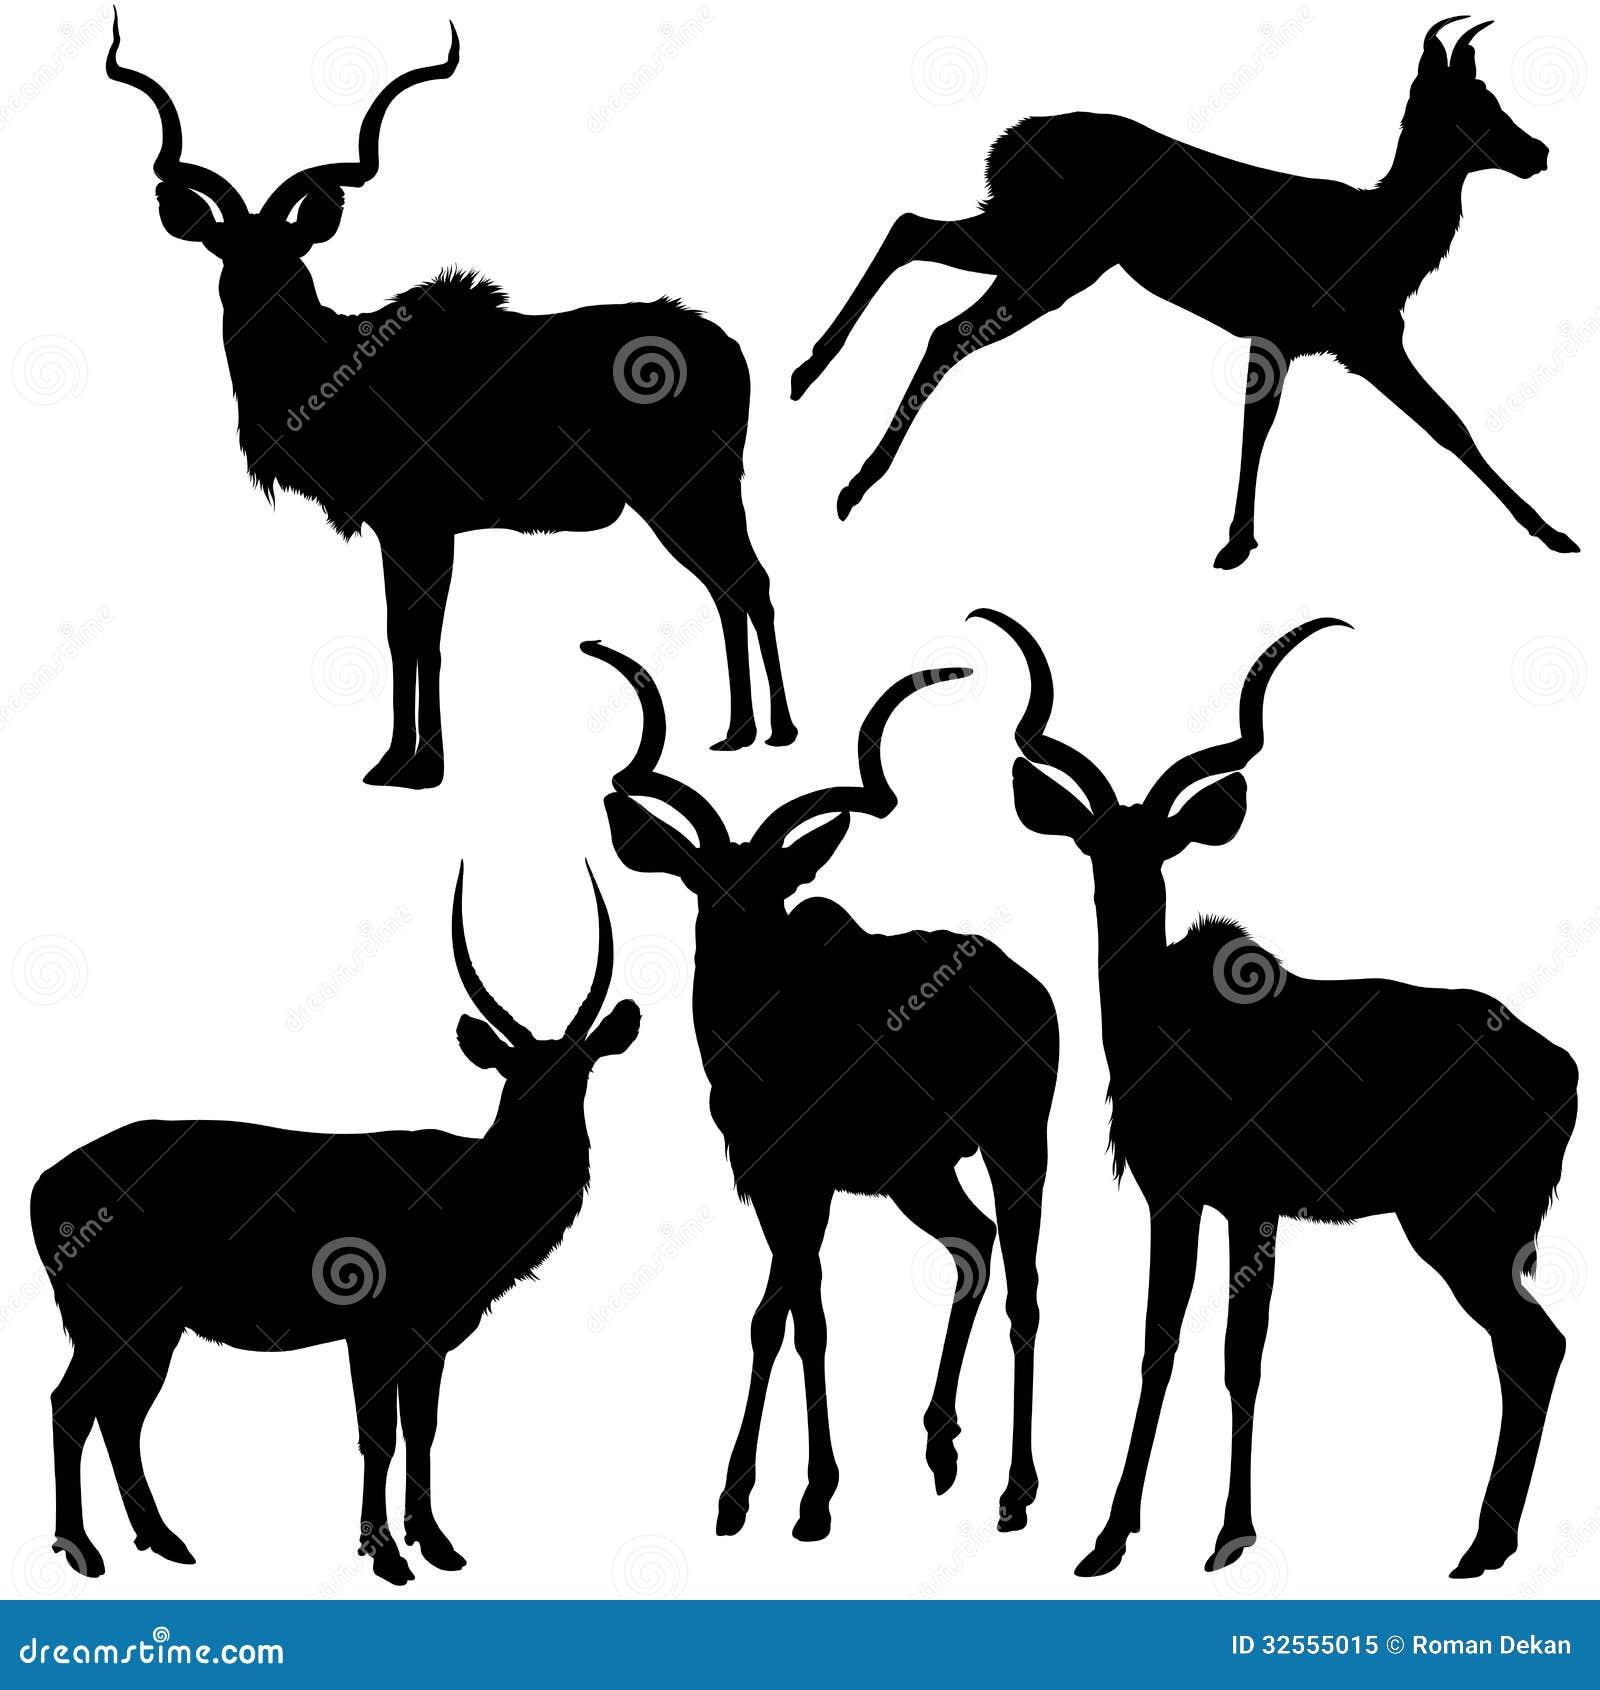 antelope silhouettes royalty free stock photo image 32555015